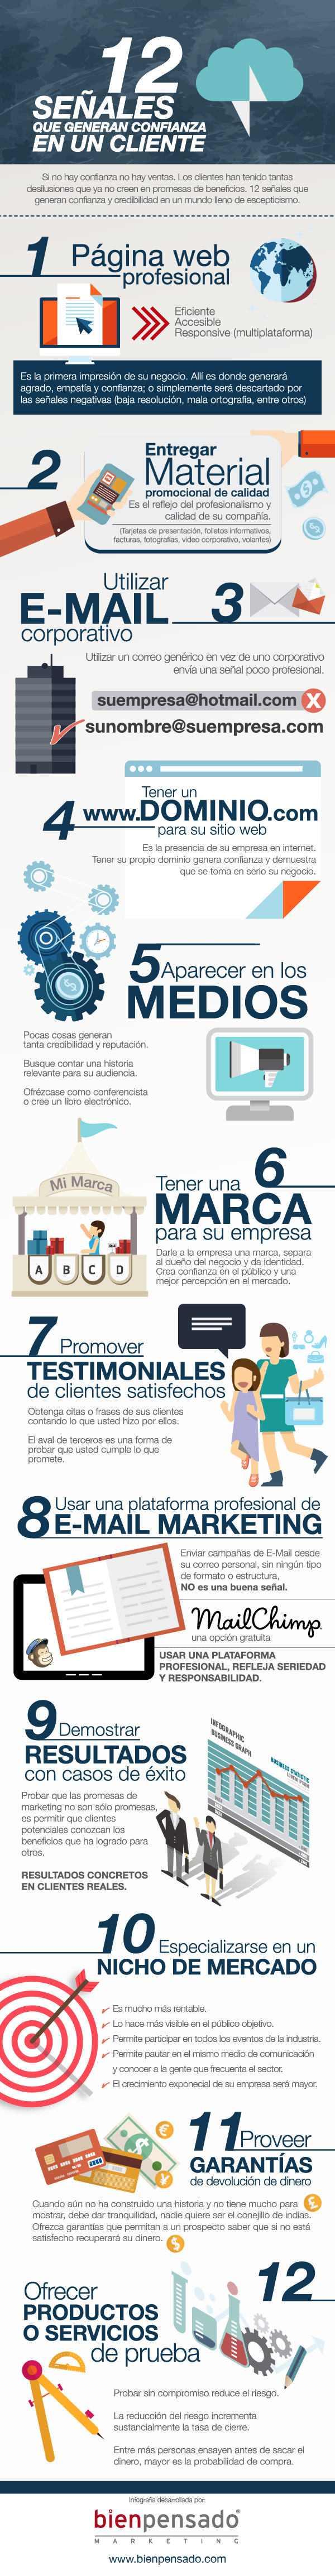 12formas-confianza-clientela-infografia